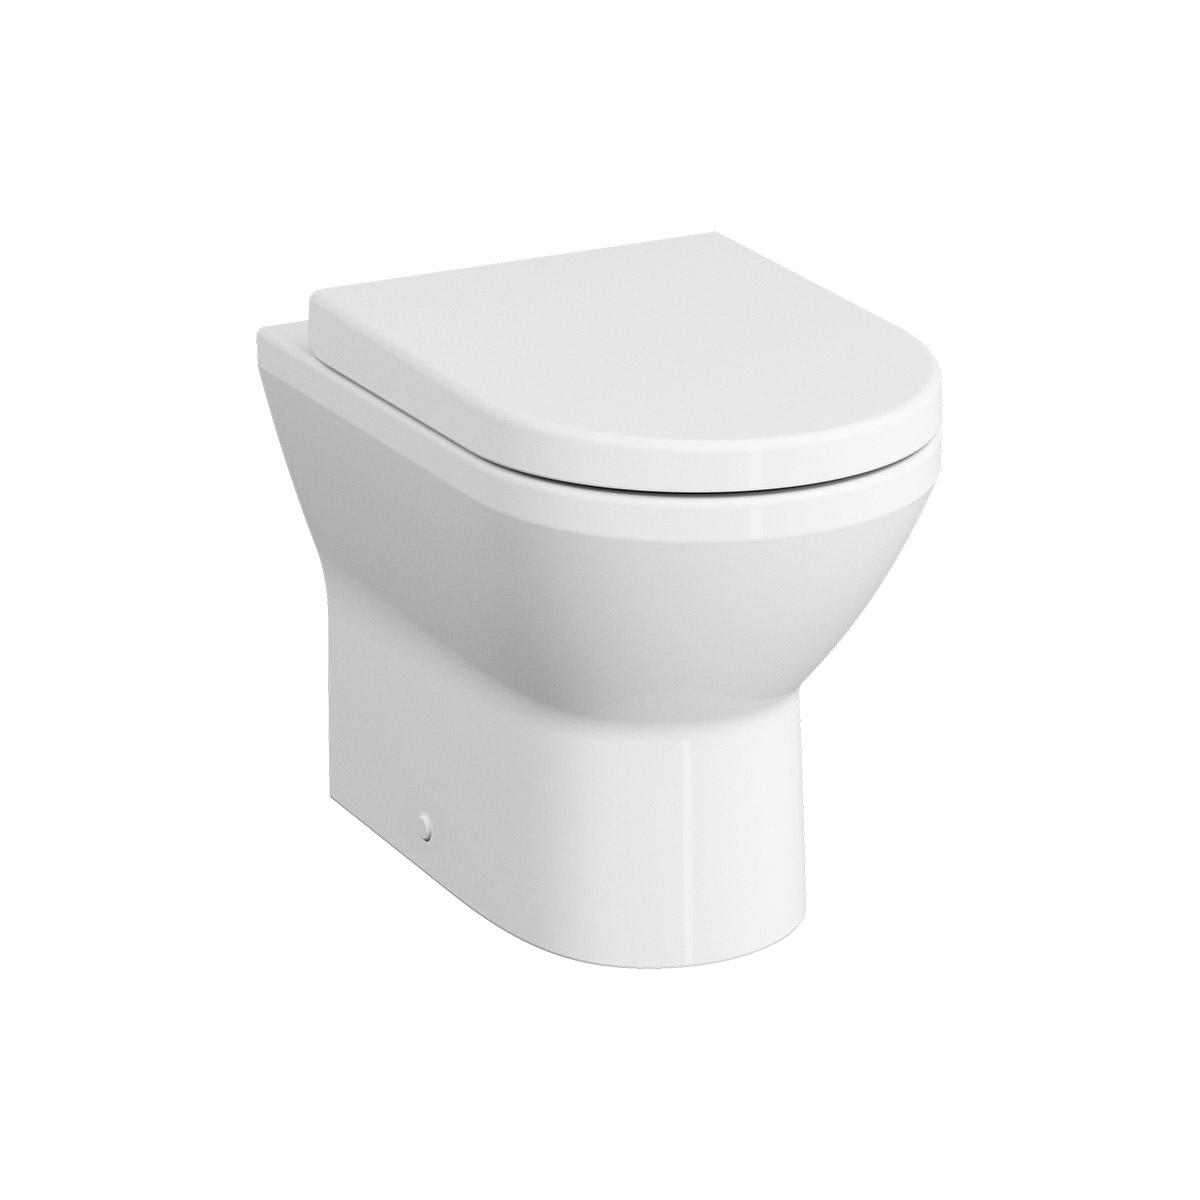 Integra Stand-WC VitrA Flush 2.0 (ohne Spülrand), Tiefspüler